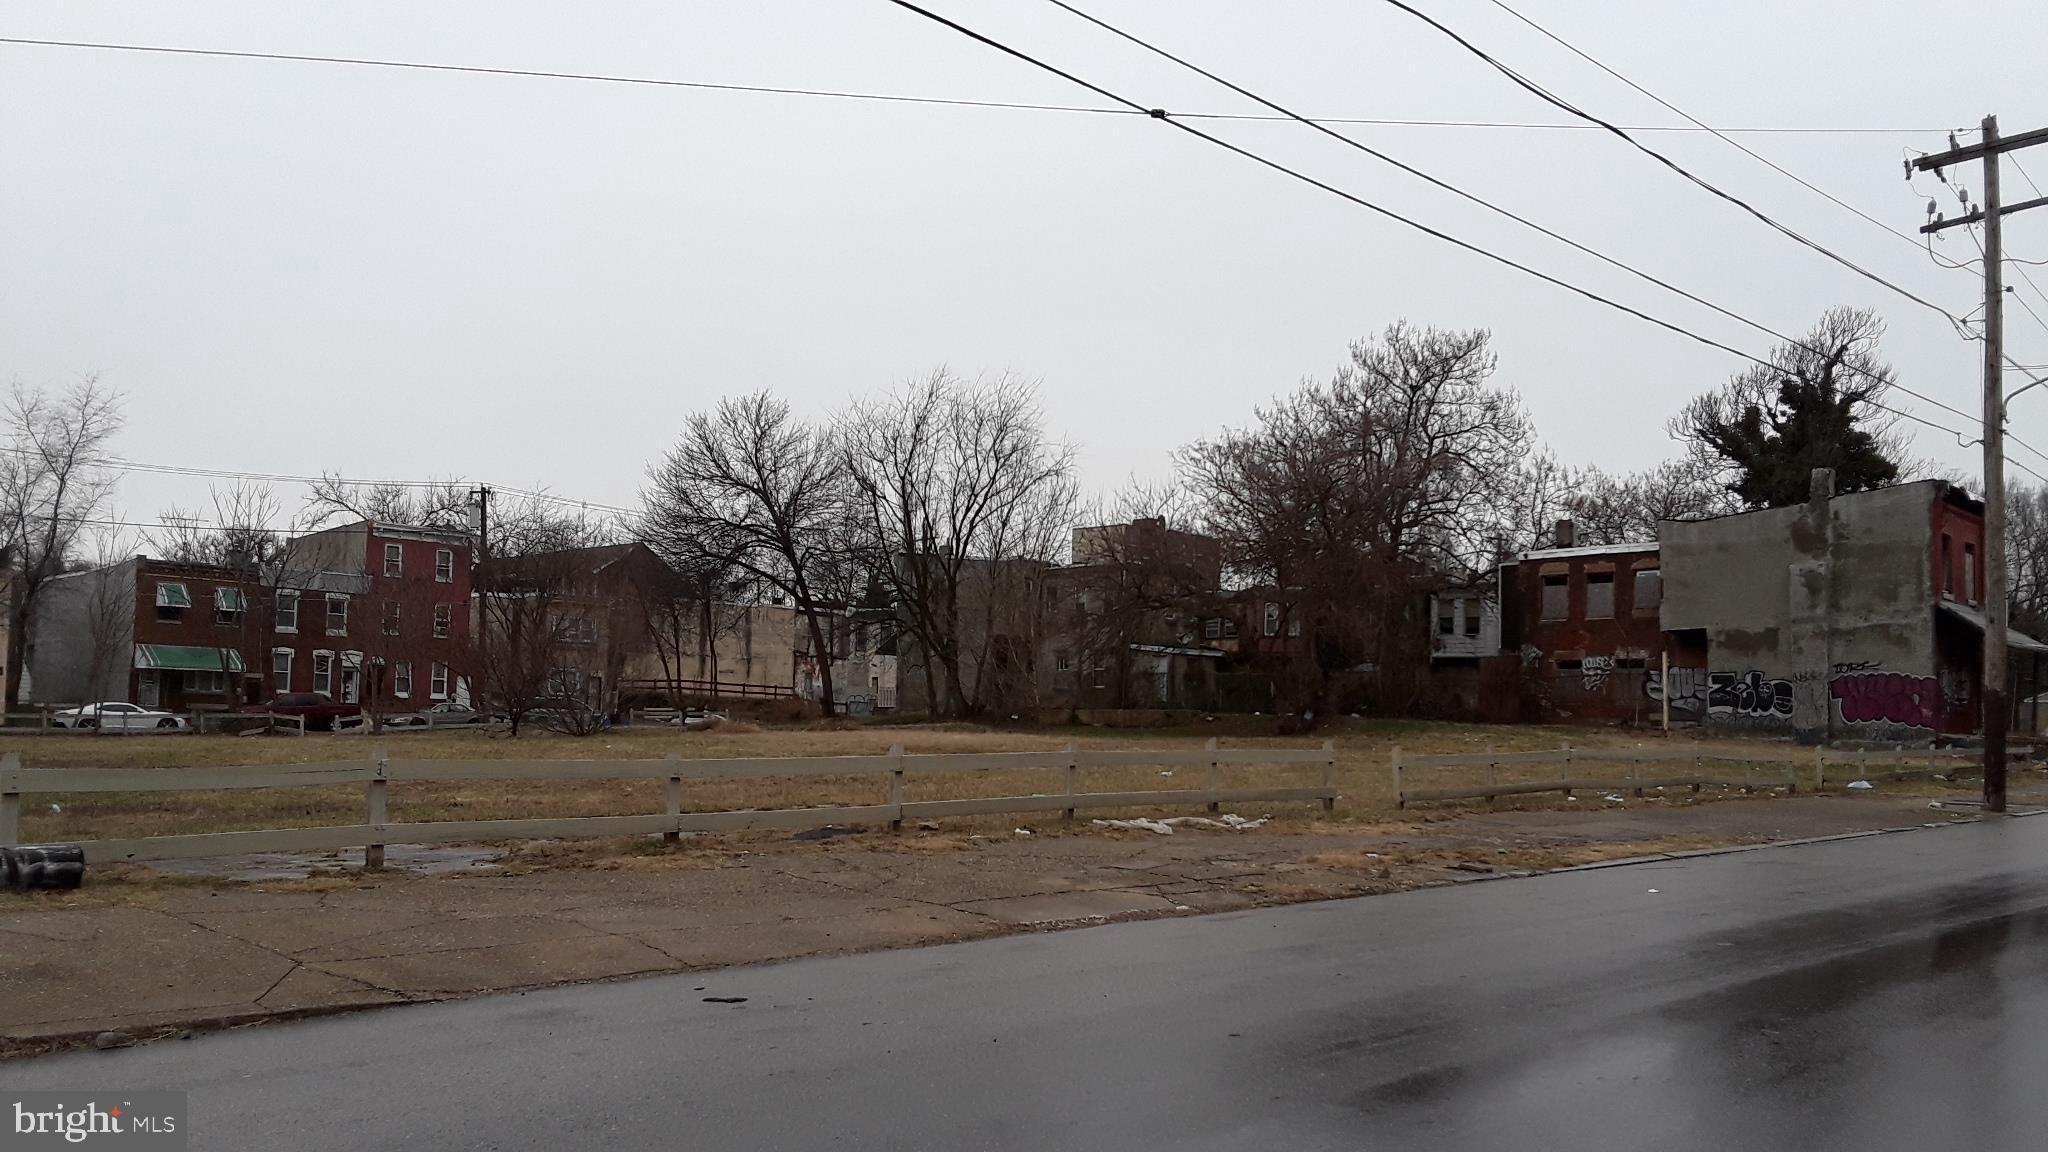 2242 N 9TH STREET, PHILADELPHIA, PA 19133